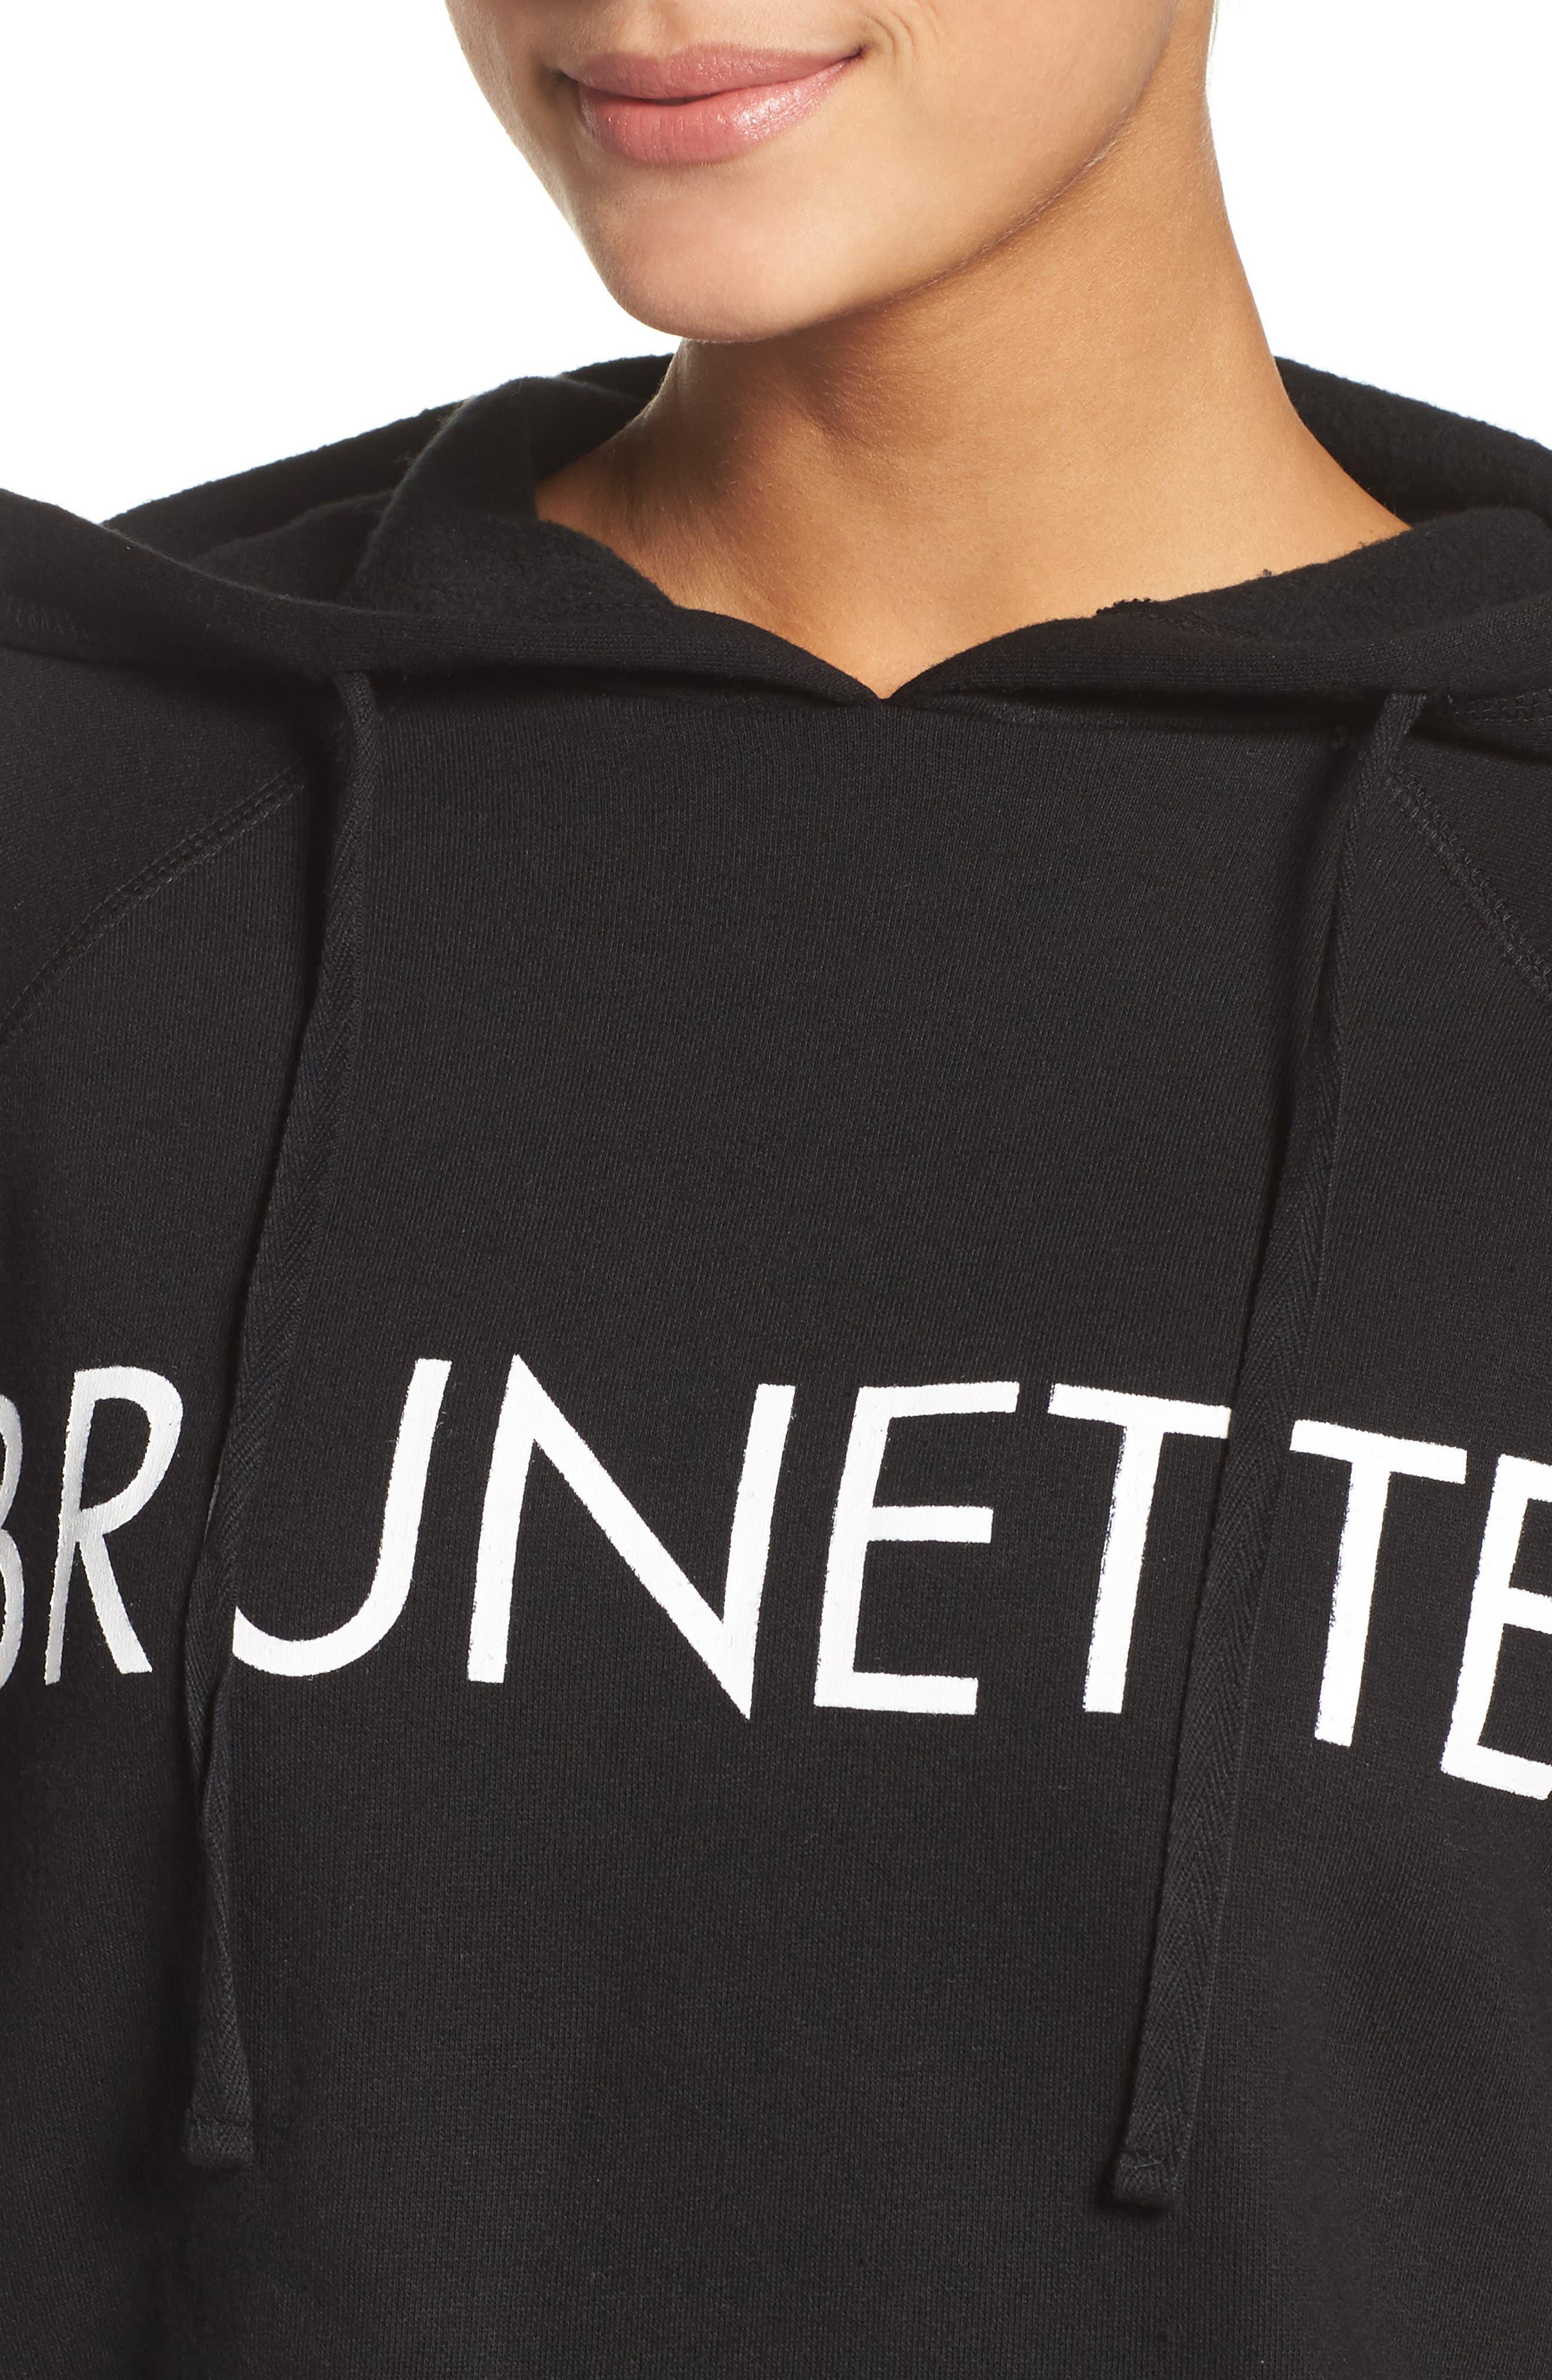 Brunette Lounge Hoodie,                             Alternate thumbnail 4, color,                             Black